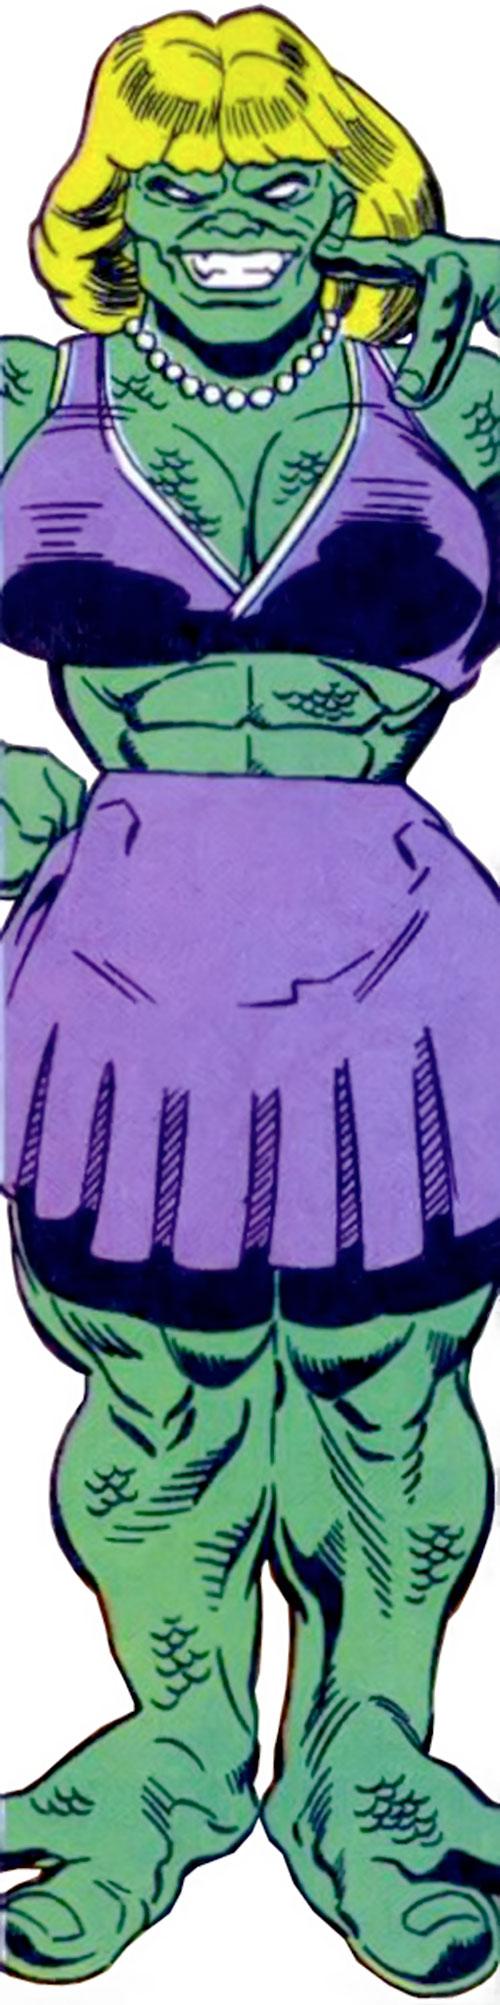 Abominatrix (Marvel Comics)